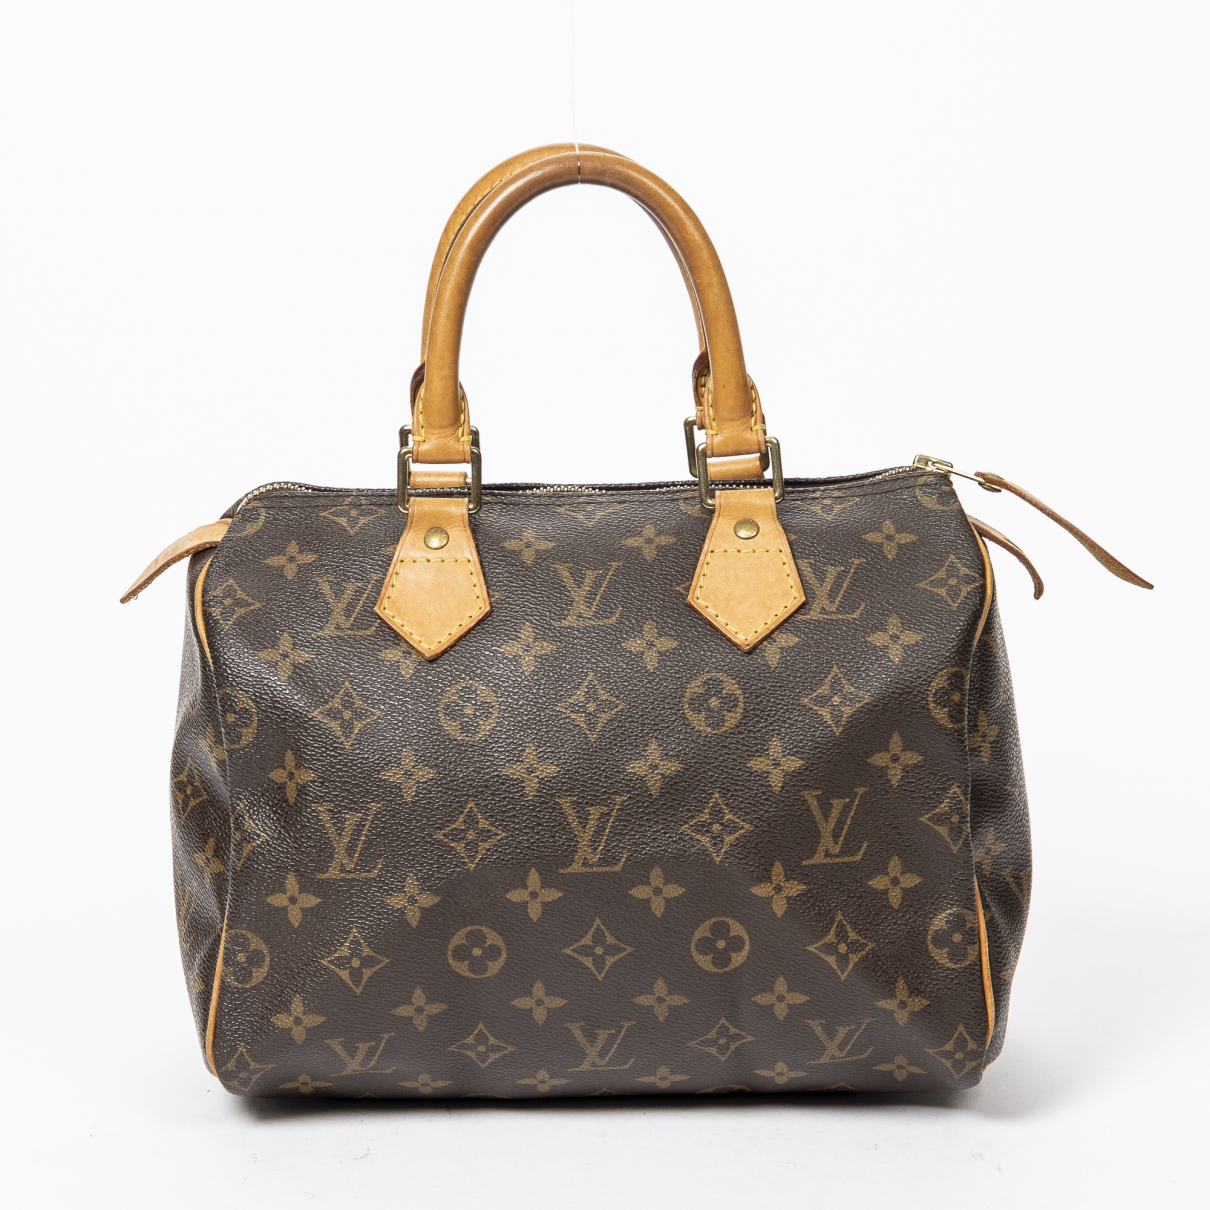 Louis Vuitton - Sac a main Speedy pour femme en coton - marron